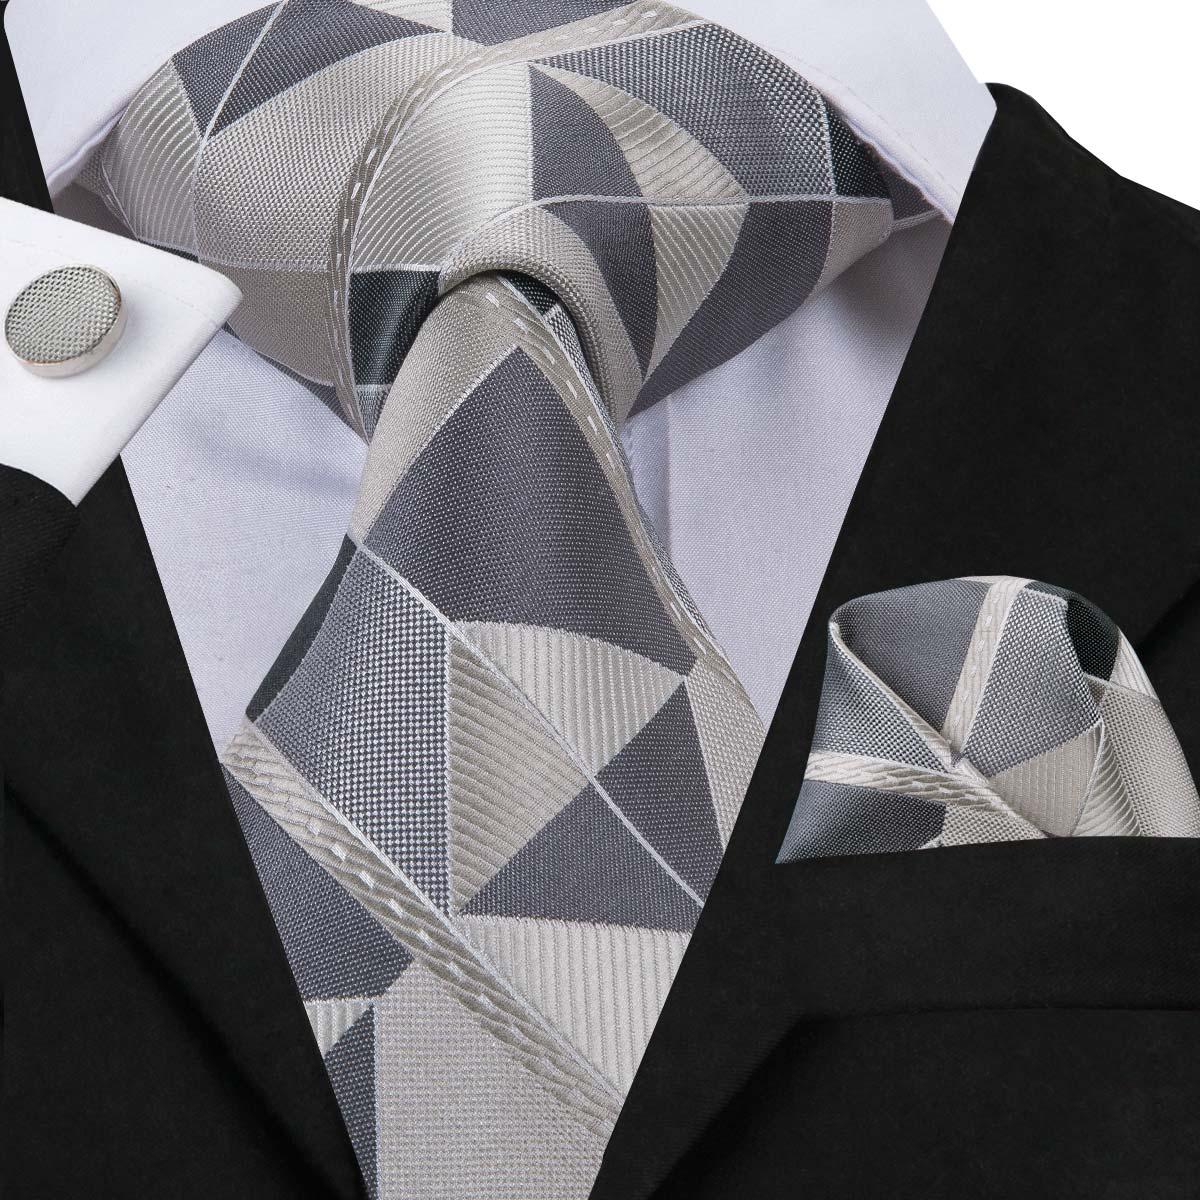 Hi-Tie 2019 Fashion Novelty Necktie Men's Grey Plaid Ties For Men 8.5cm Silk Tie Handkerchief Male Business Grey Tie Set SN-3071